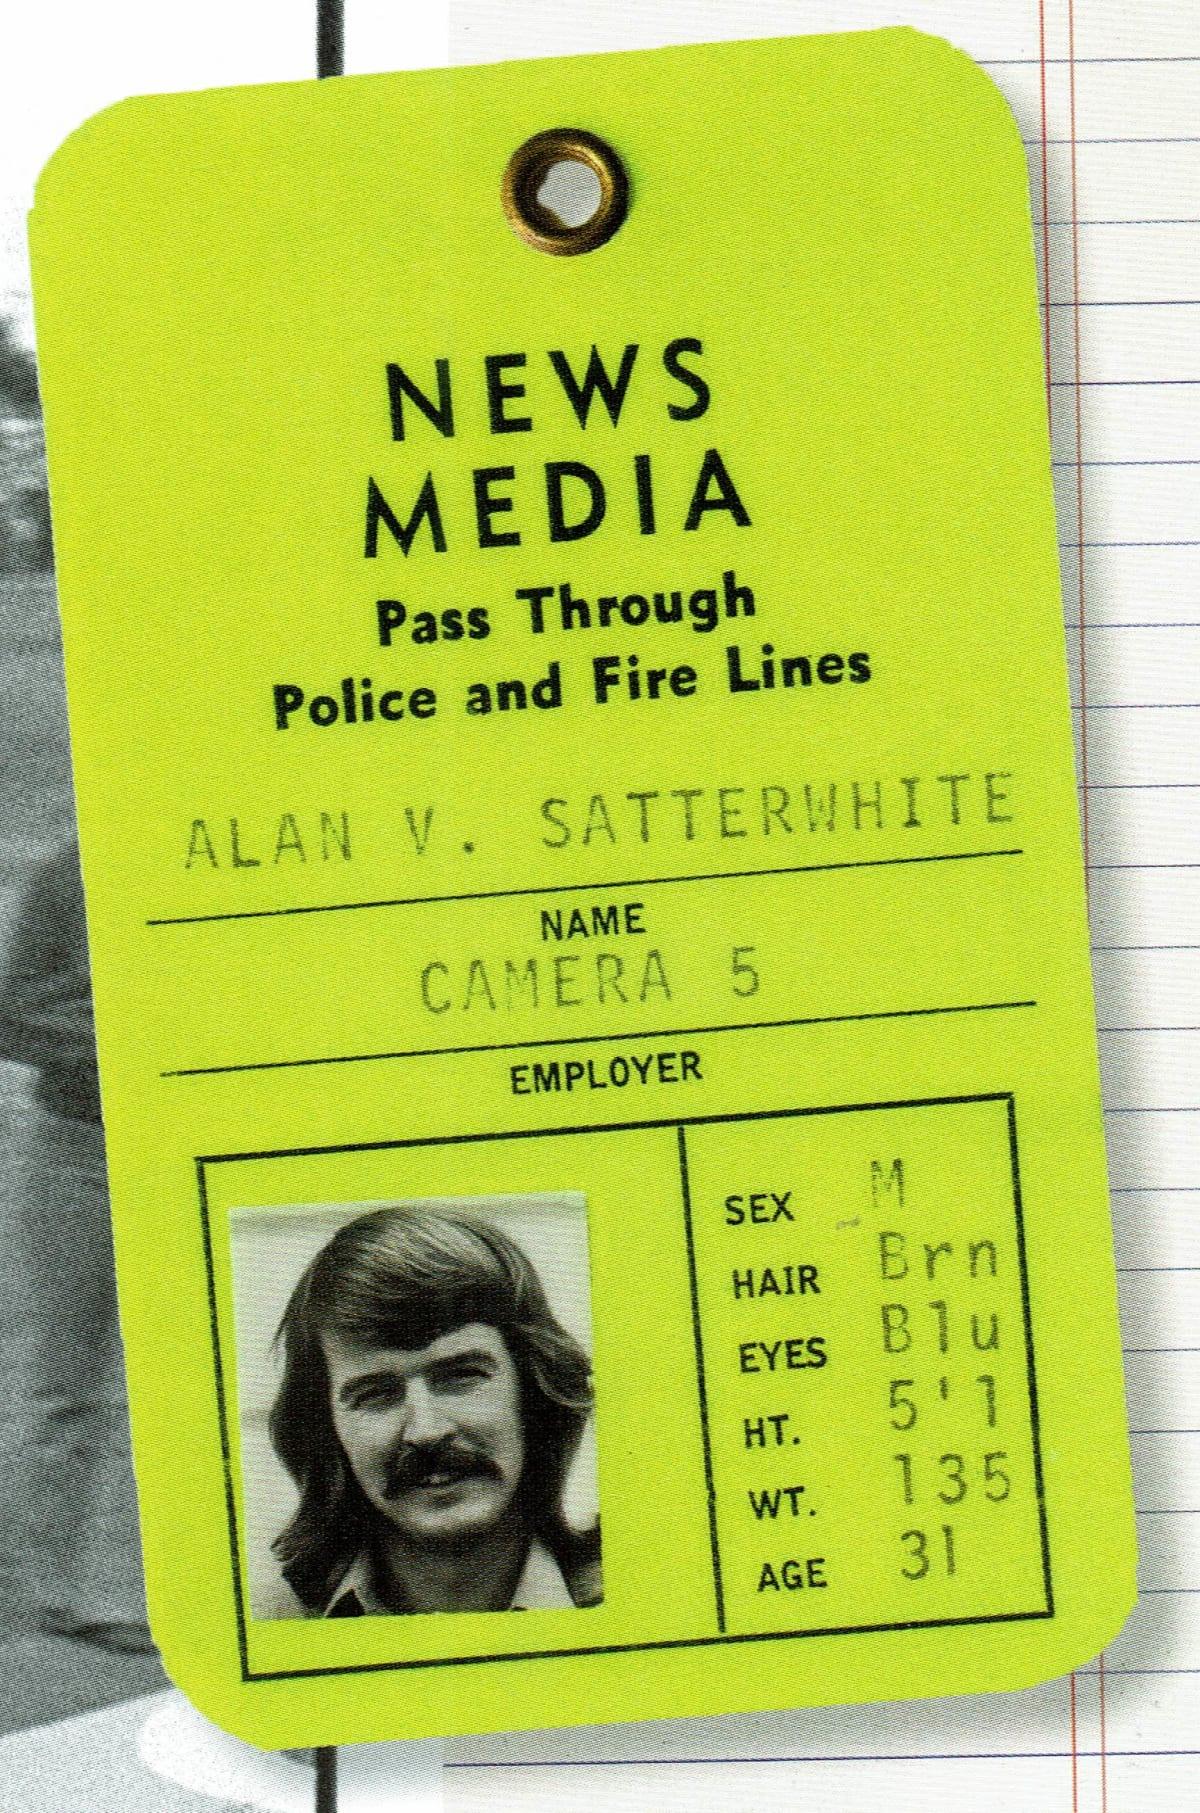 News Media pass for the author, Al Satterwhite.